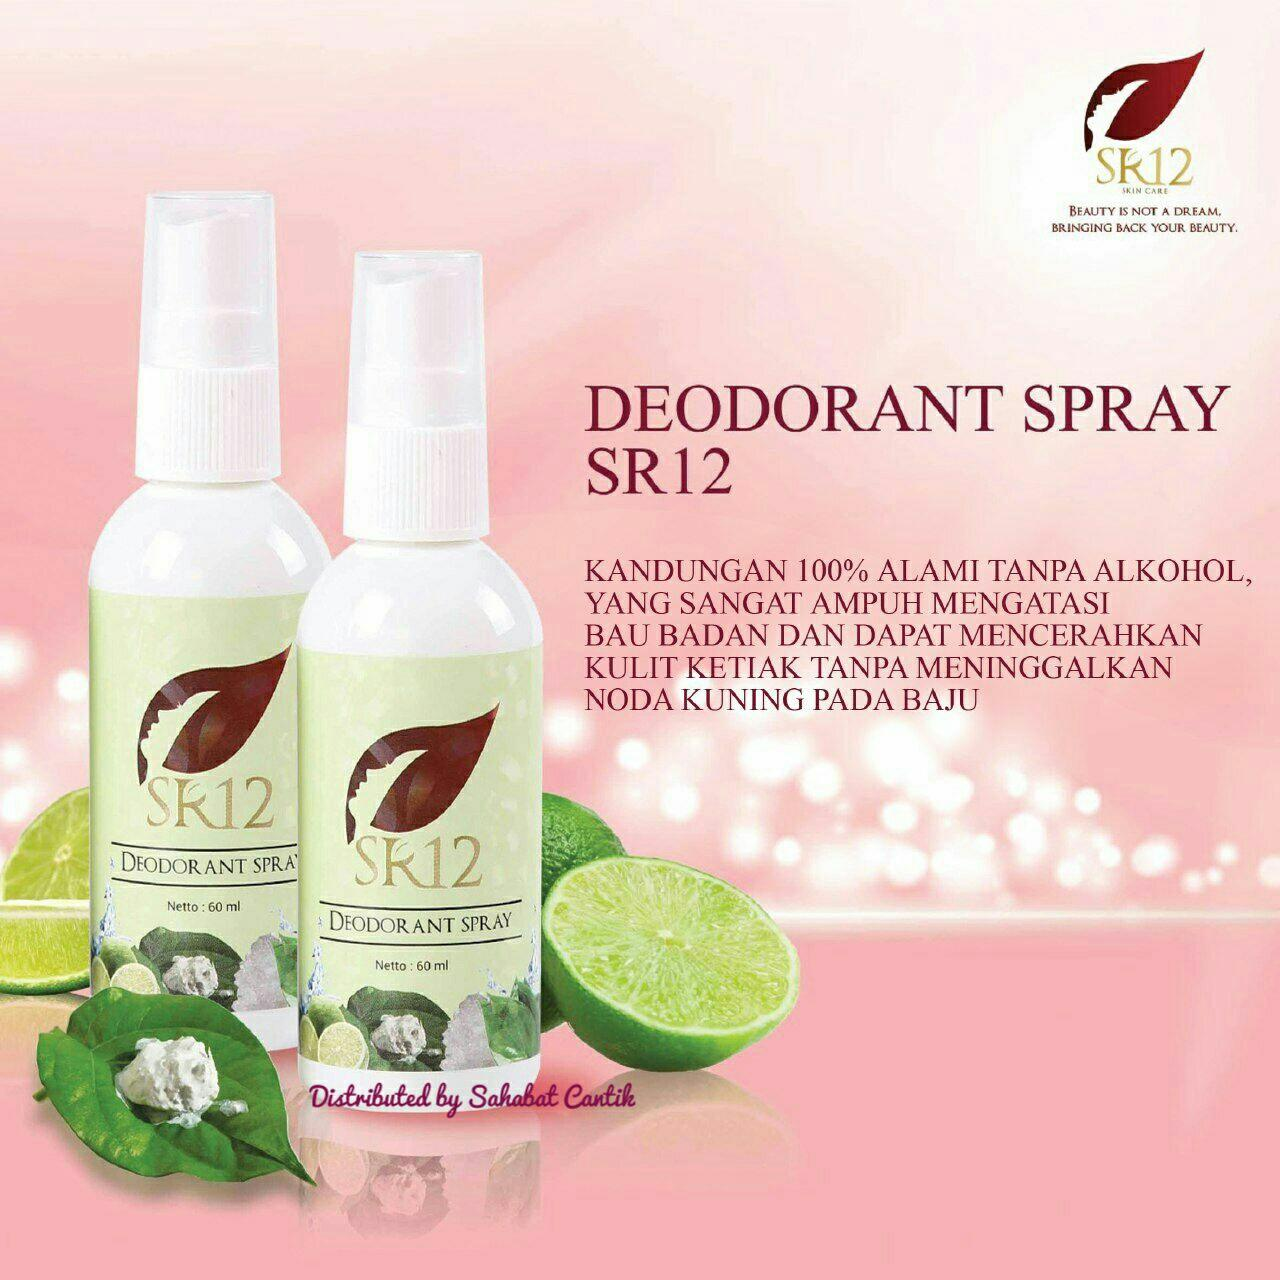 Sr12 Salimah Slim Deodorant Spray 60ml Original